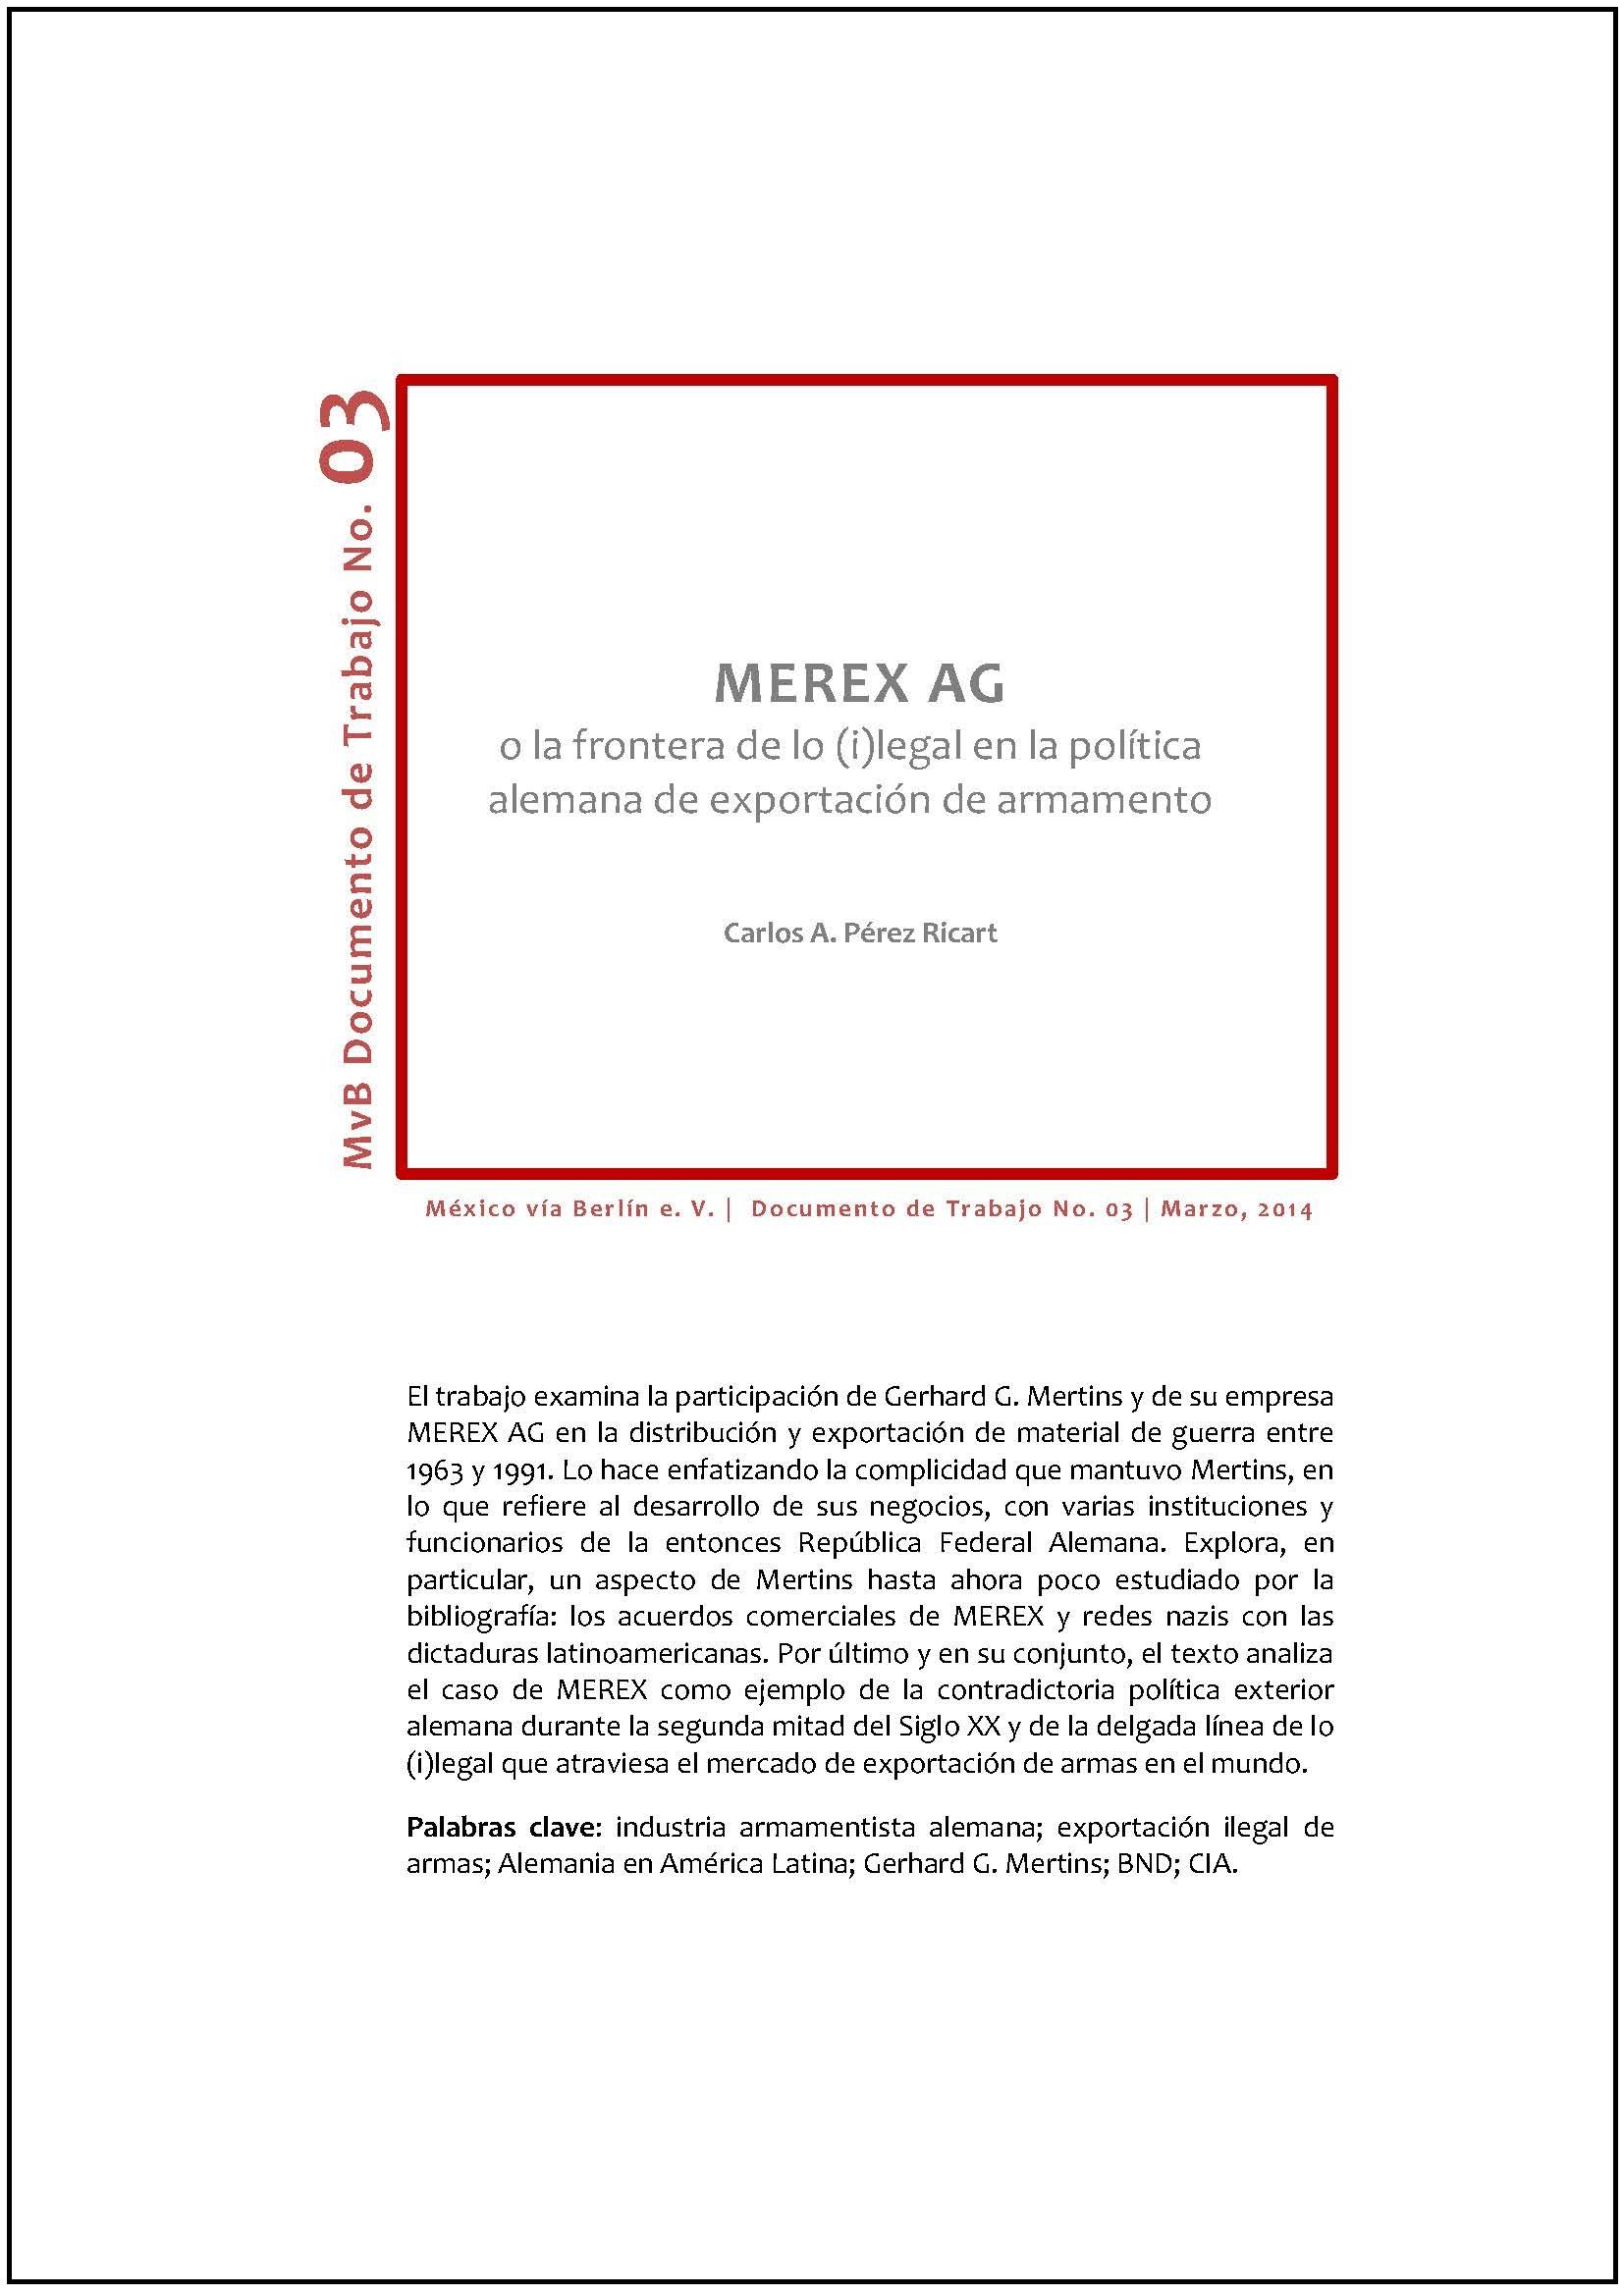 2014_003_MVB Working paper